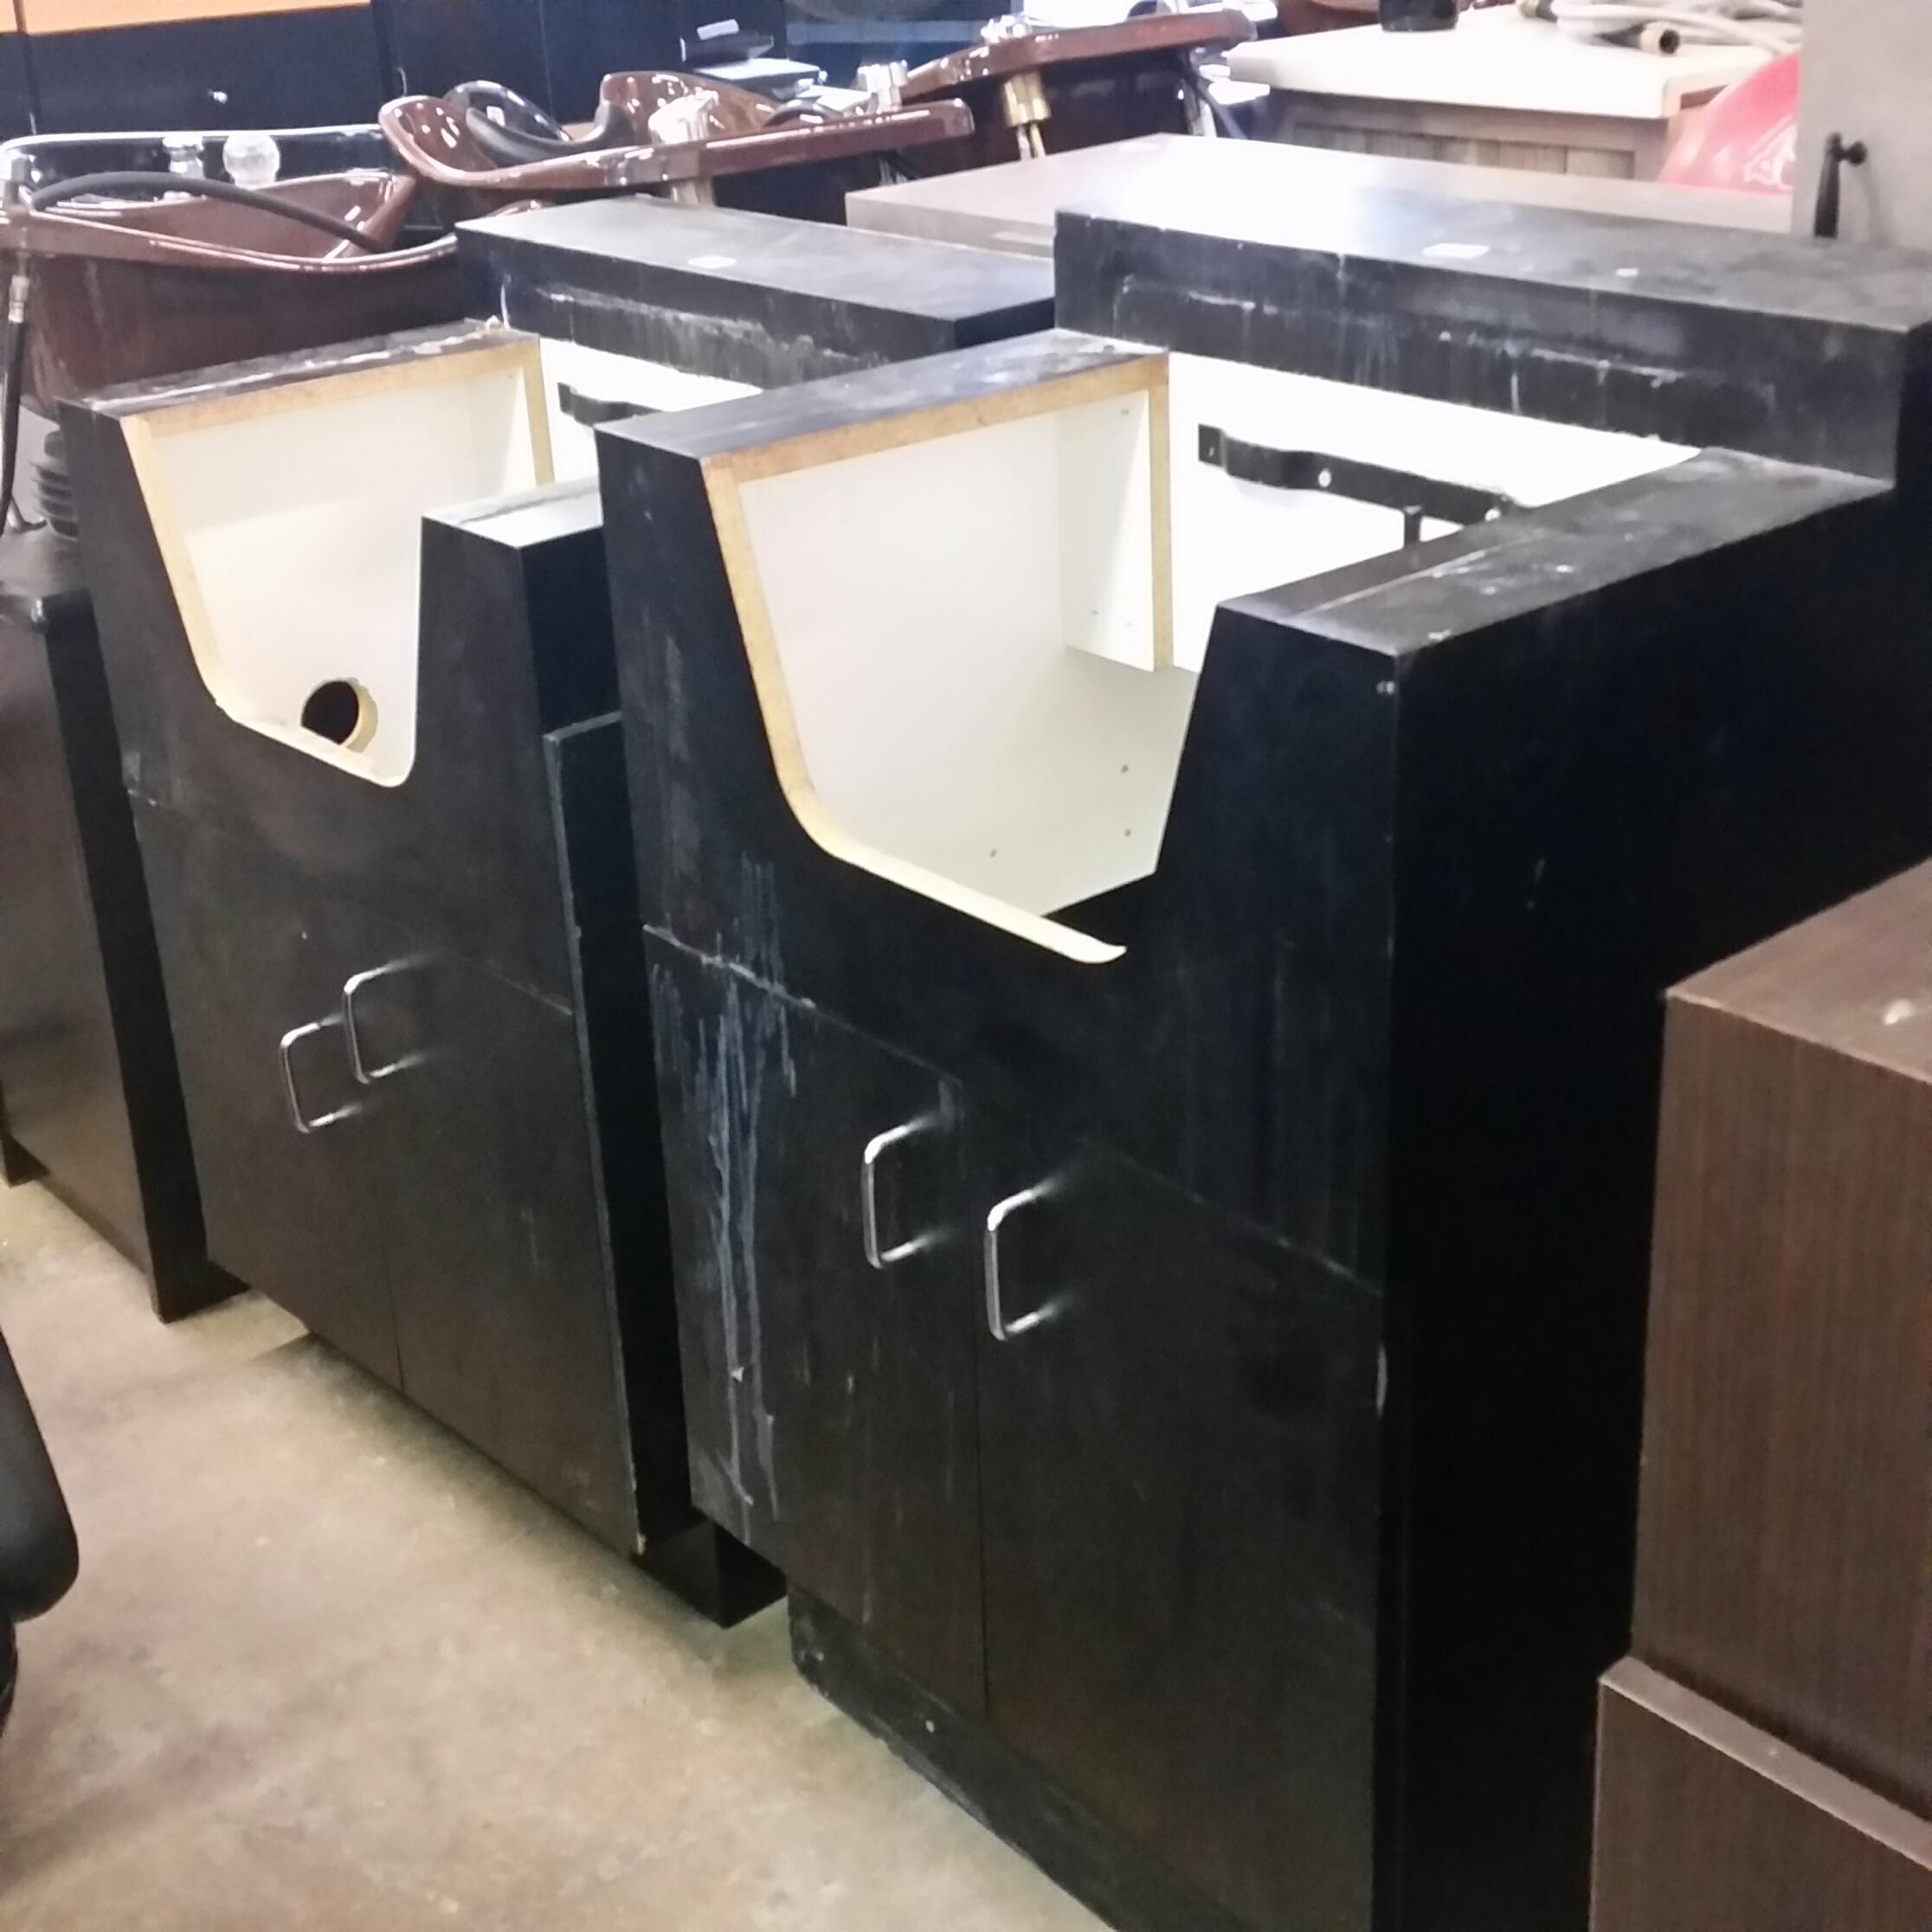 Attirant Shampoo Bowl Cabinets